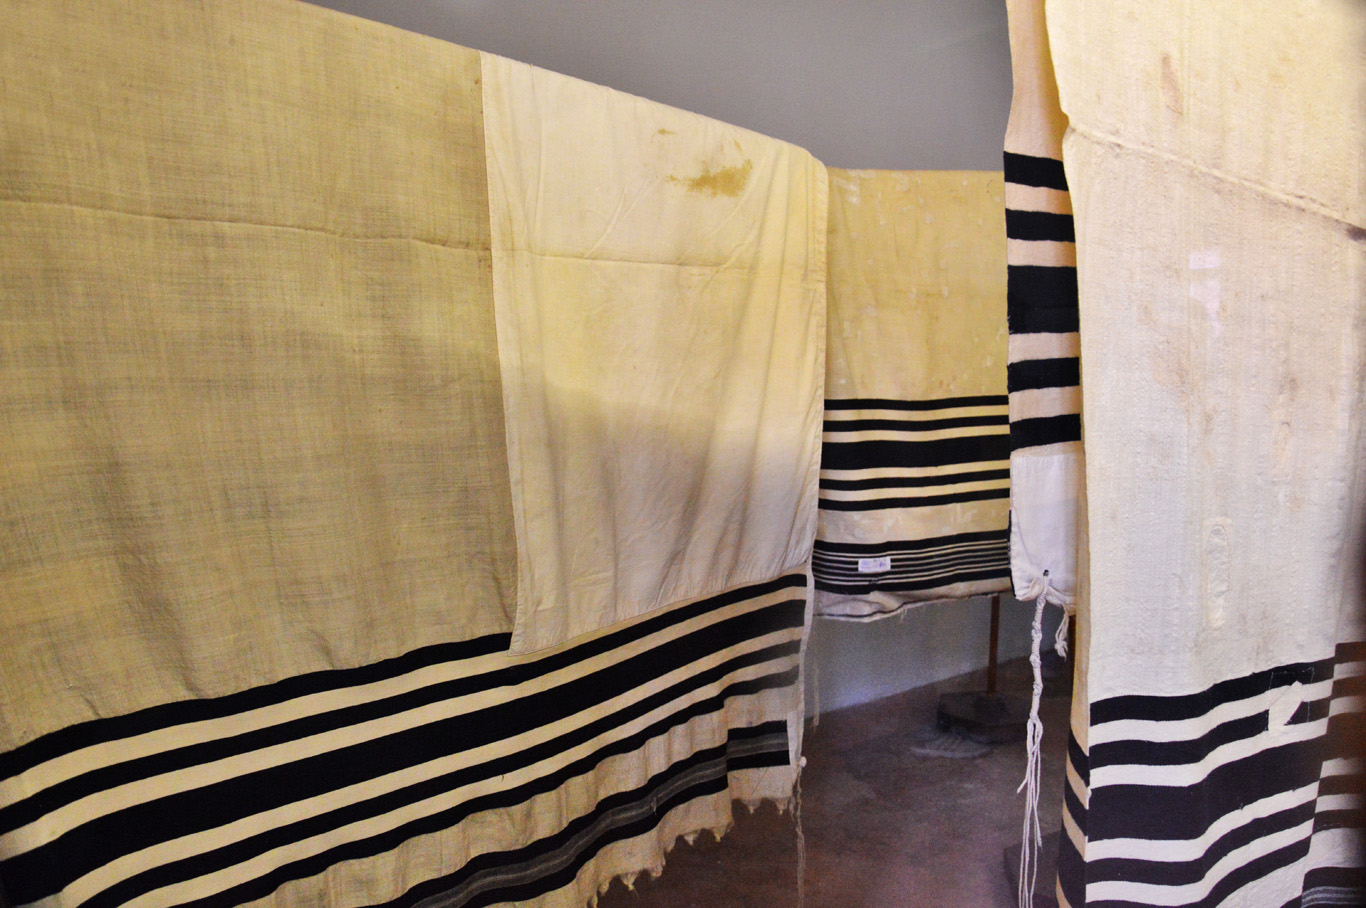 Jewish robes